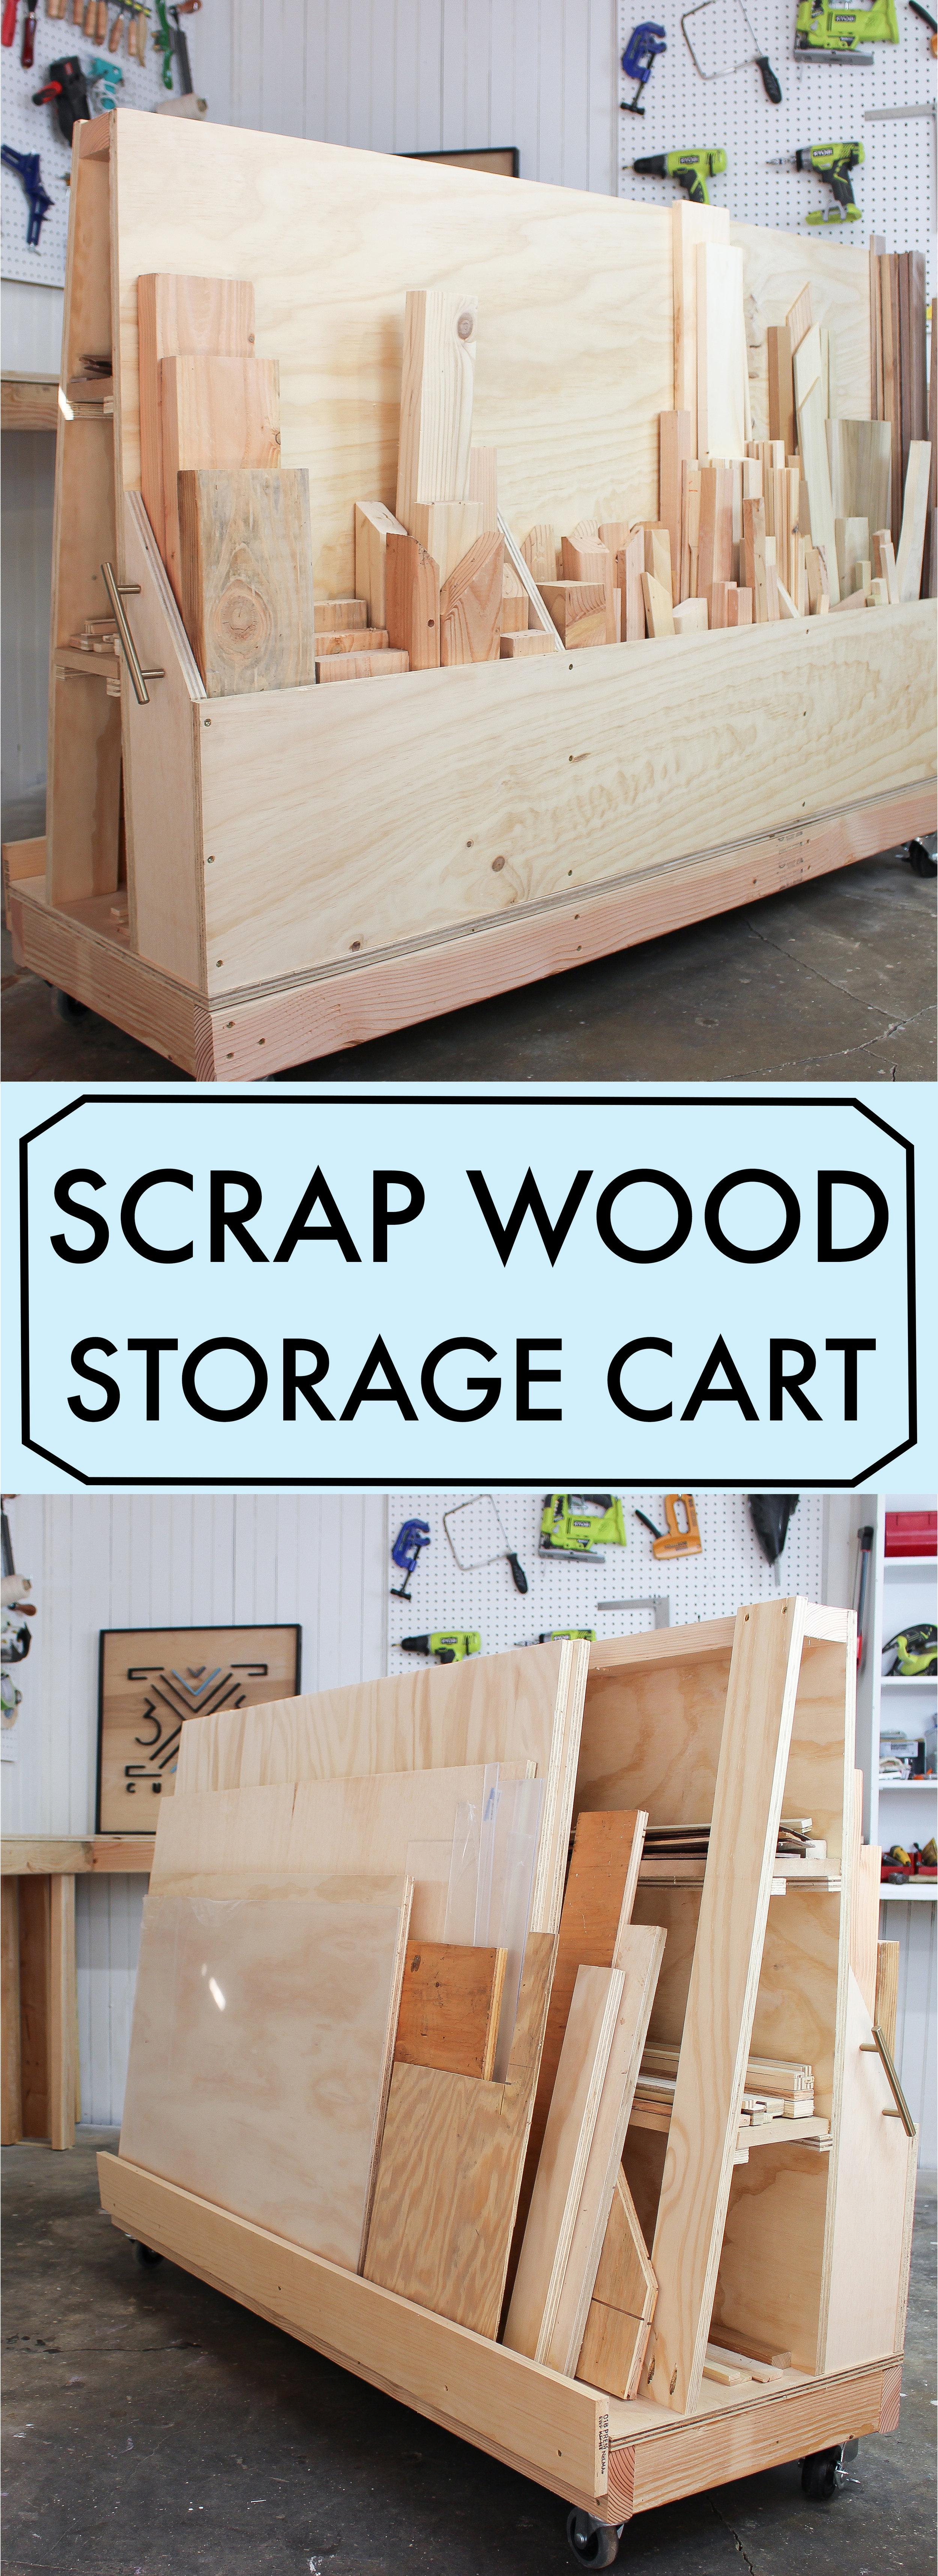 DIY Scrap Wood Storage Cart